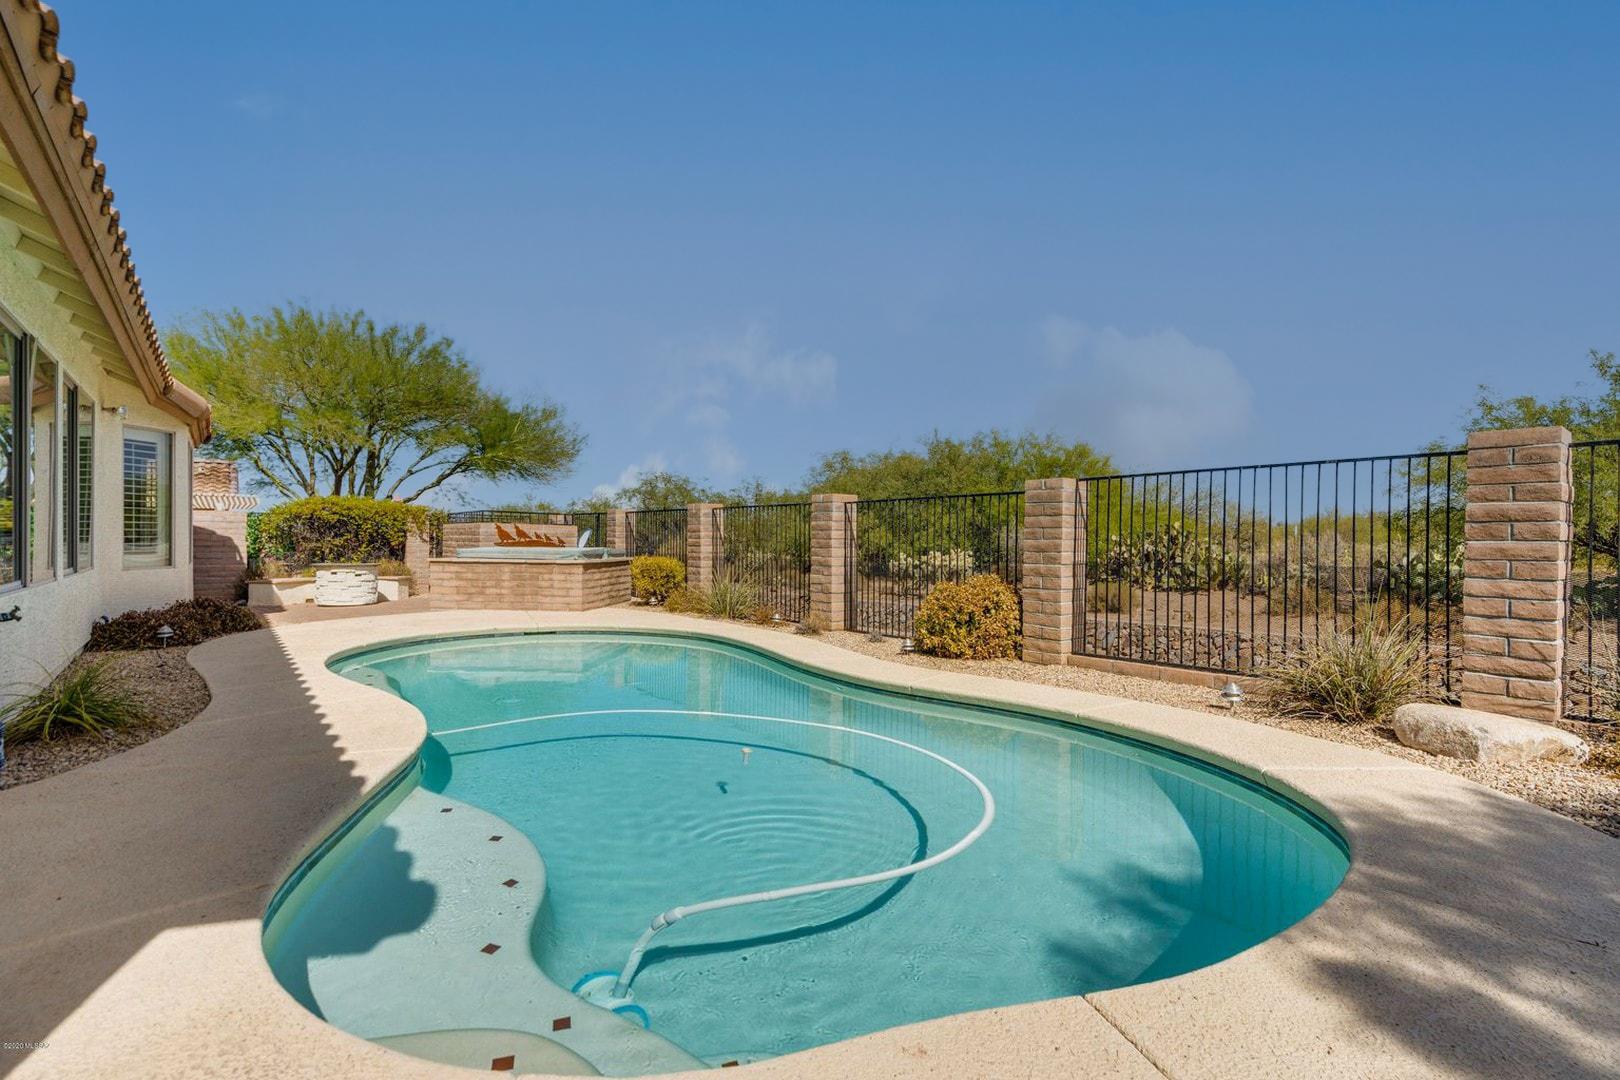 Pool - Spa - View